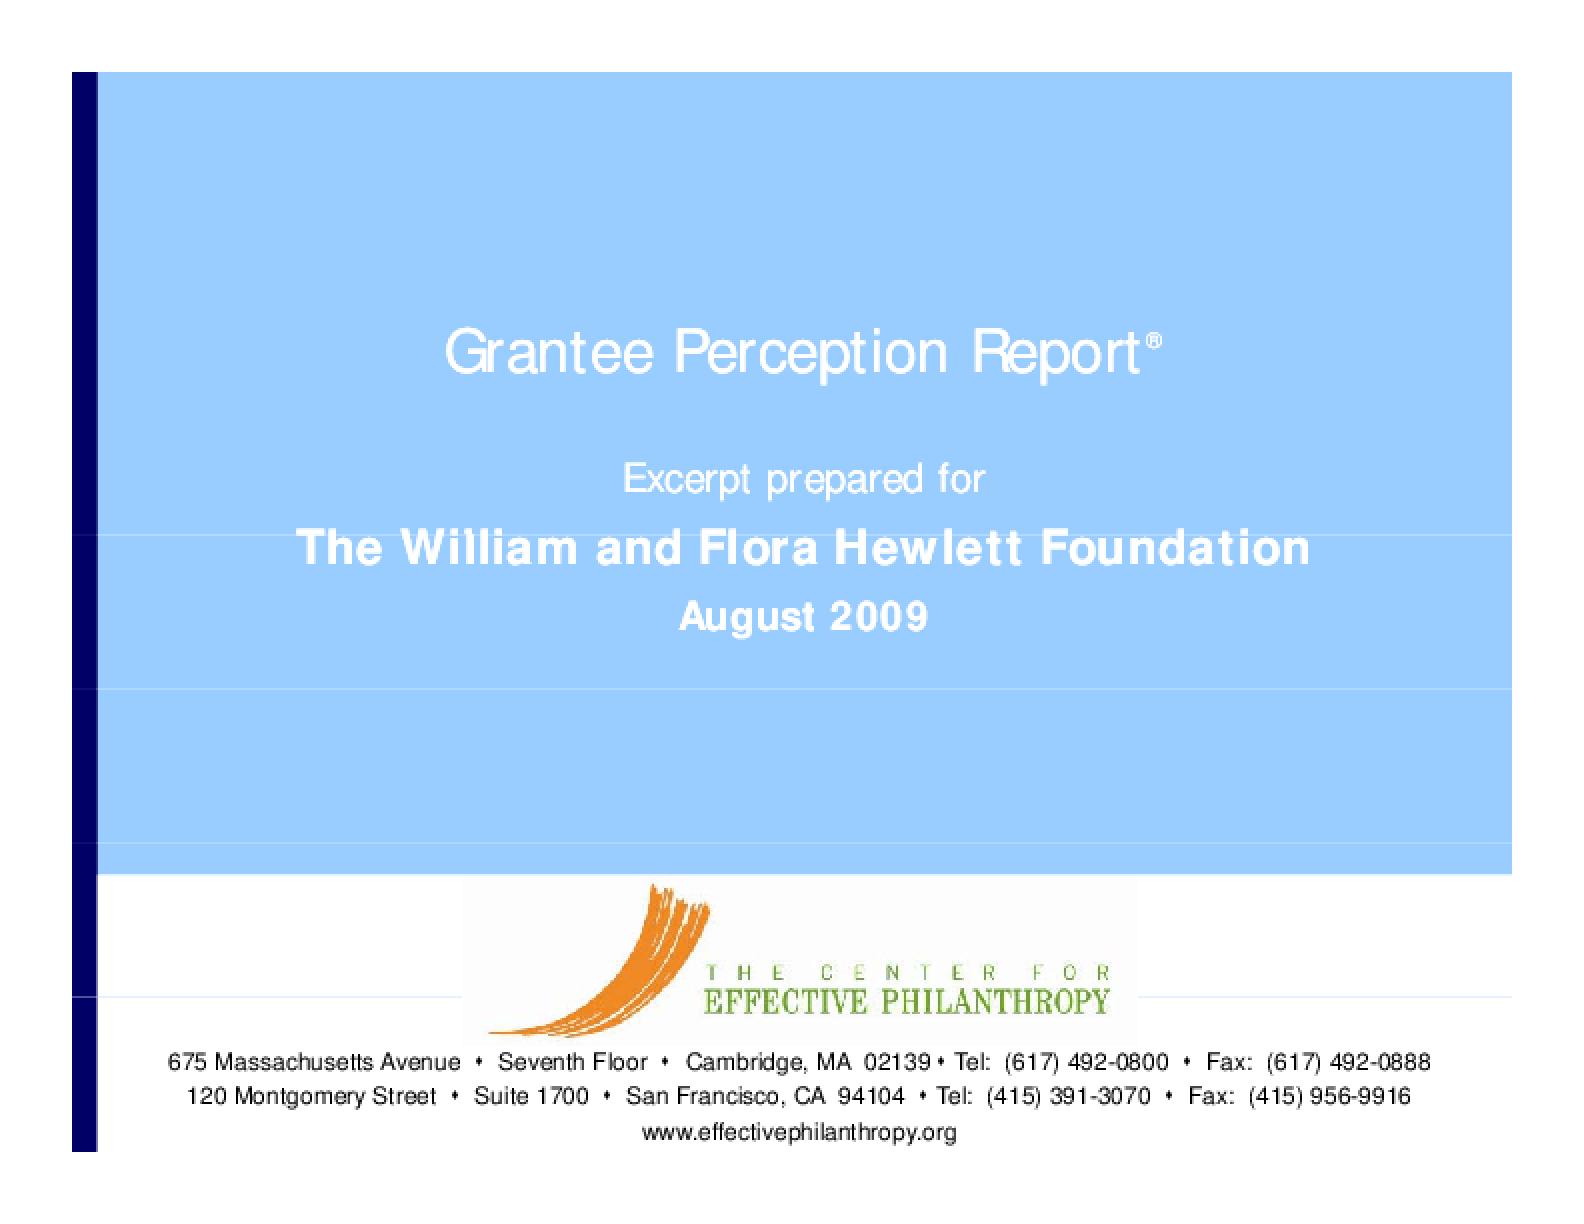 Grantee Perception Report 2009: William and Flora Hewlett Foundation